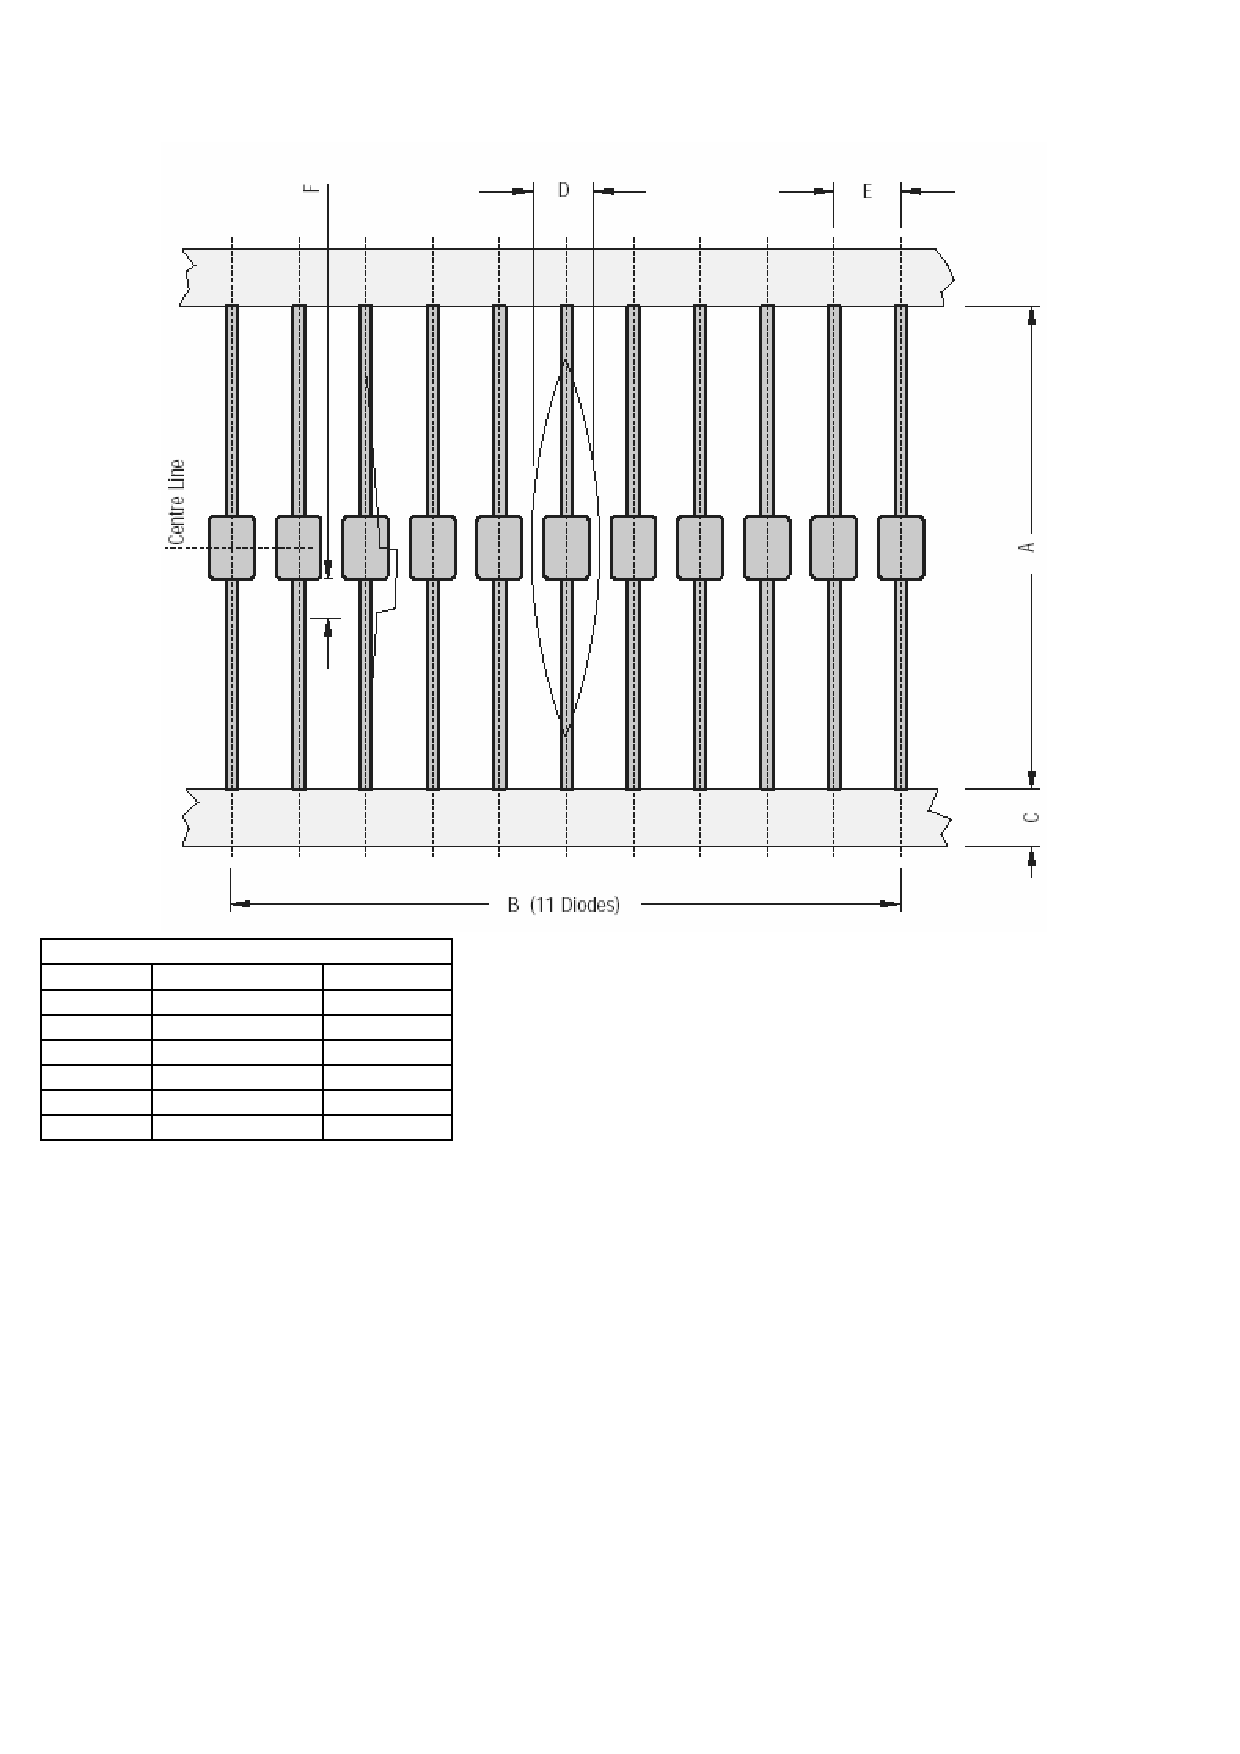 MR854 pdf, 반도체, 판매, 대치품